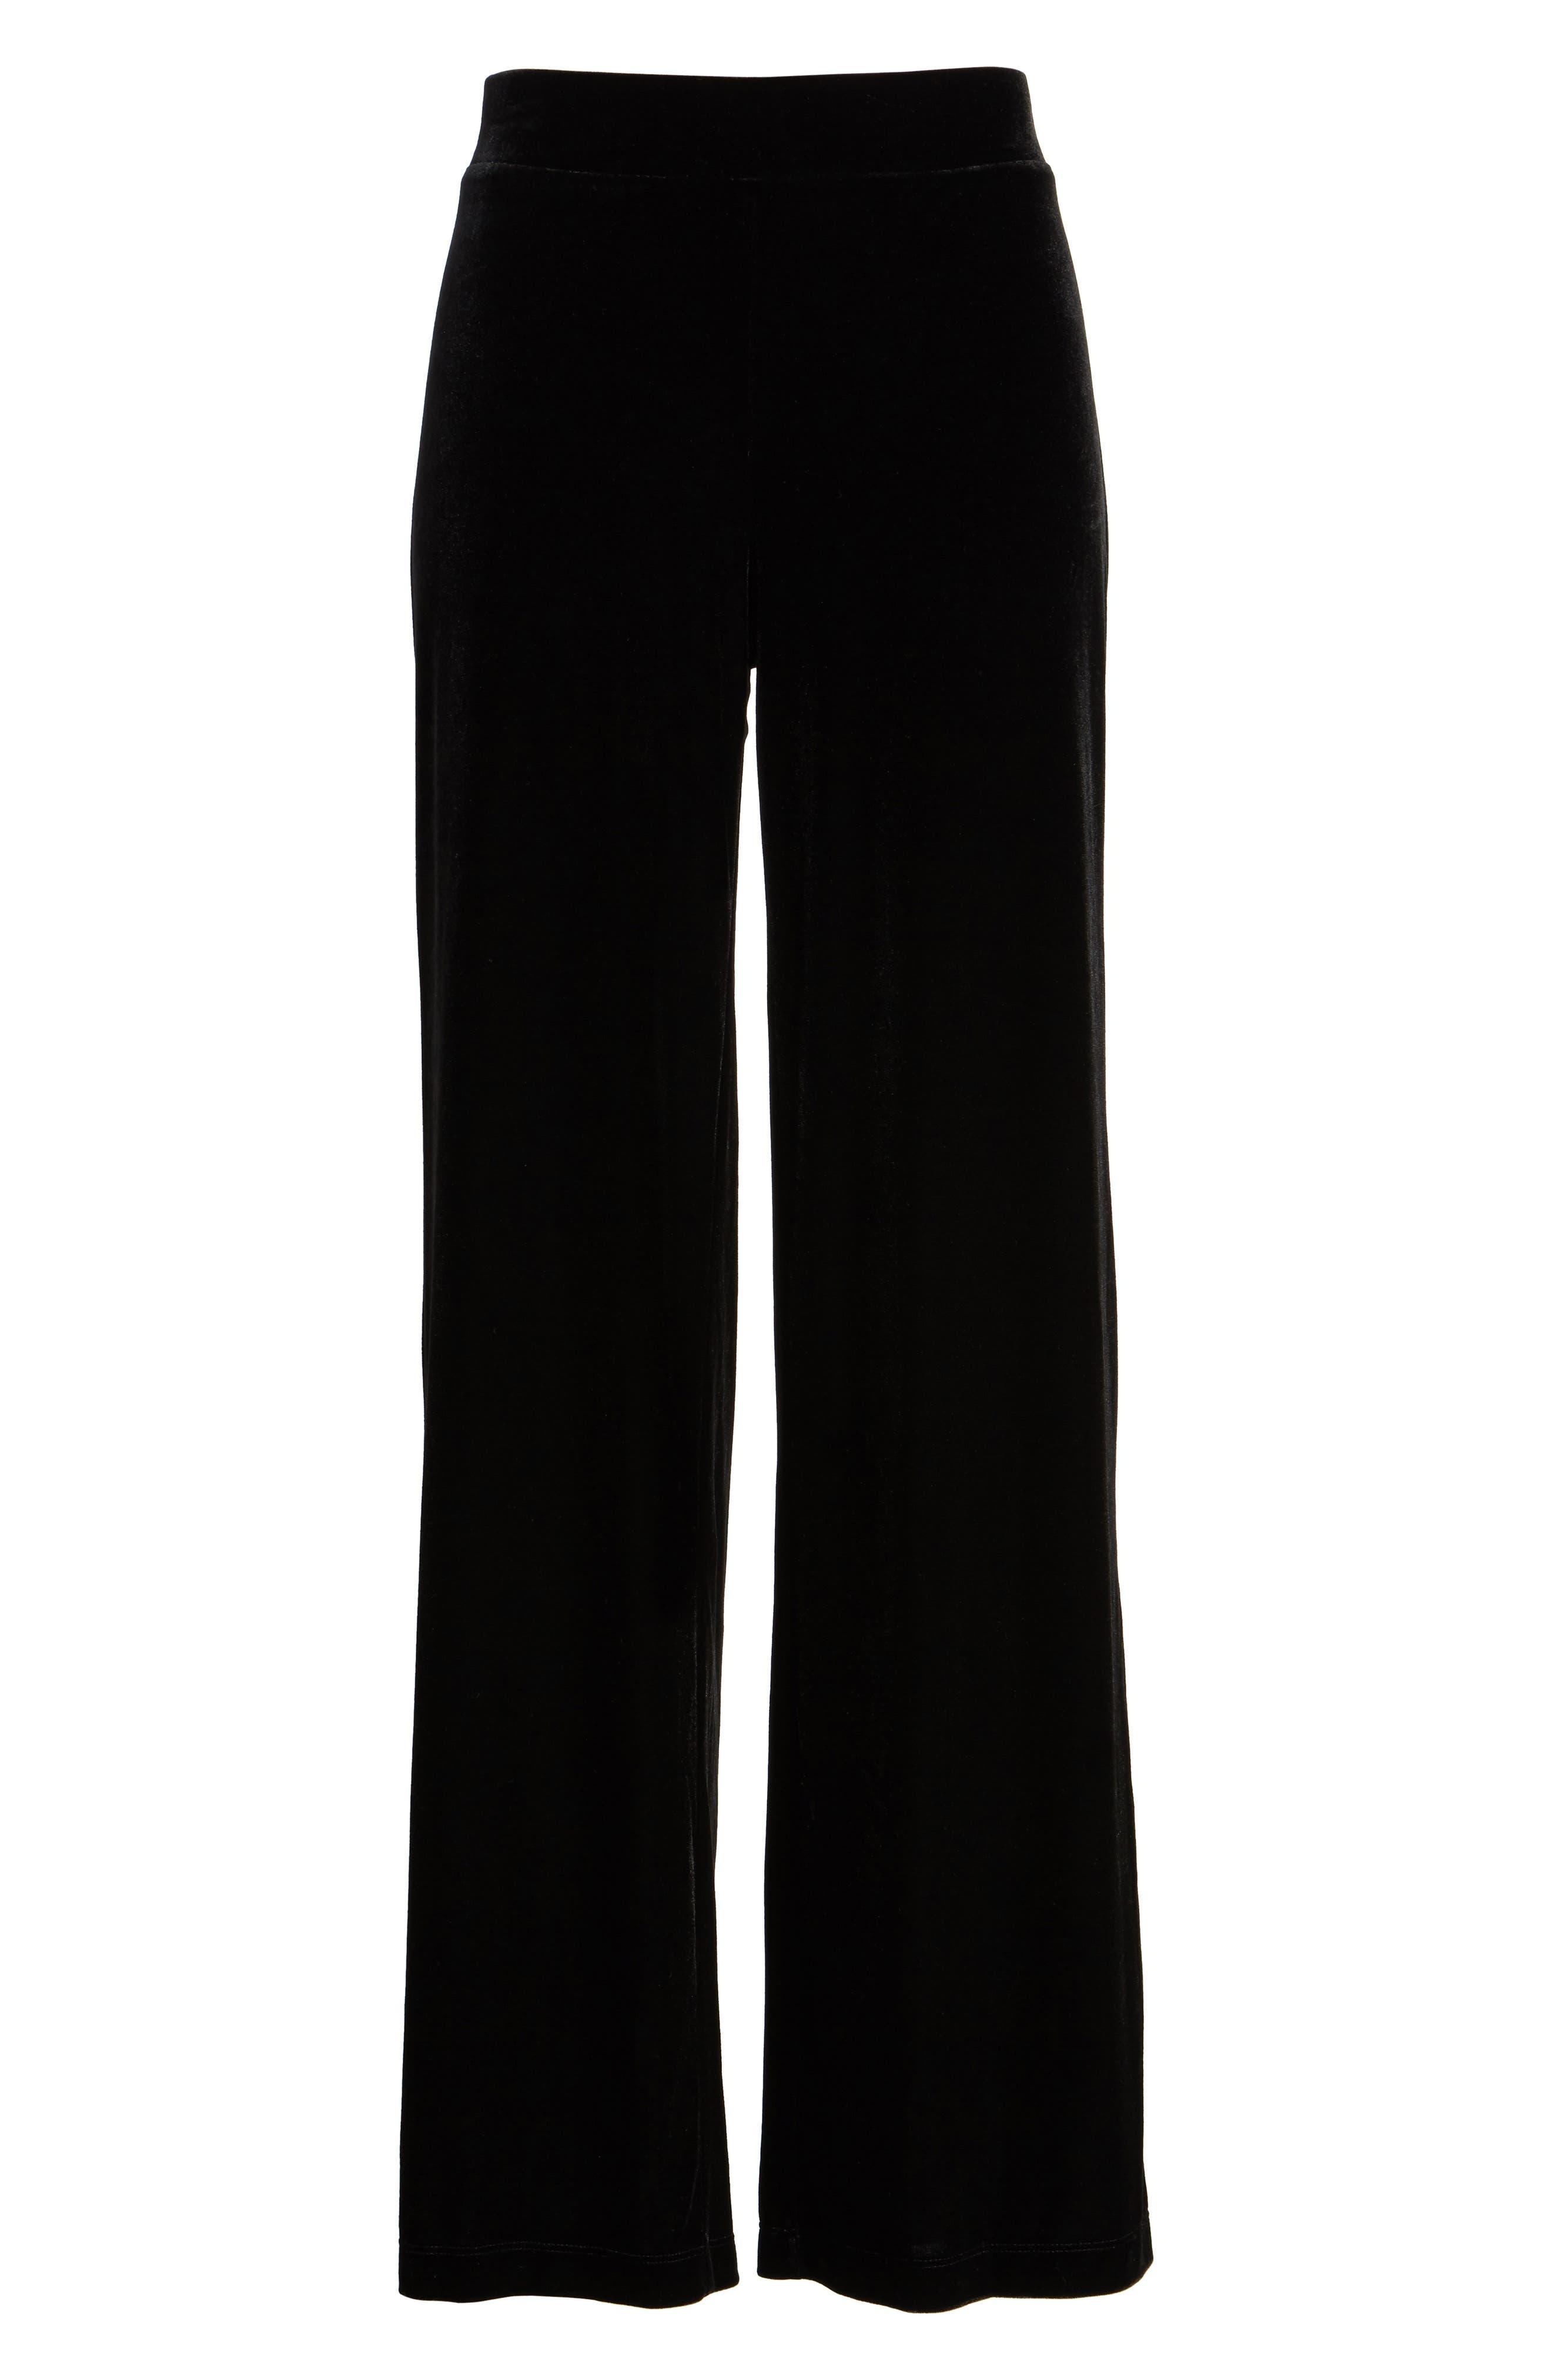 Velvet Pants,                             Alternate thumbnail 6, color,                             Rich Black